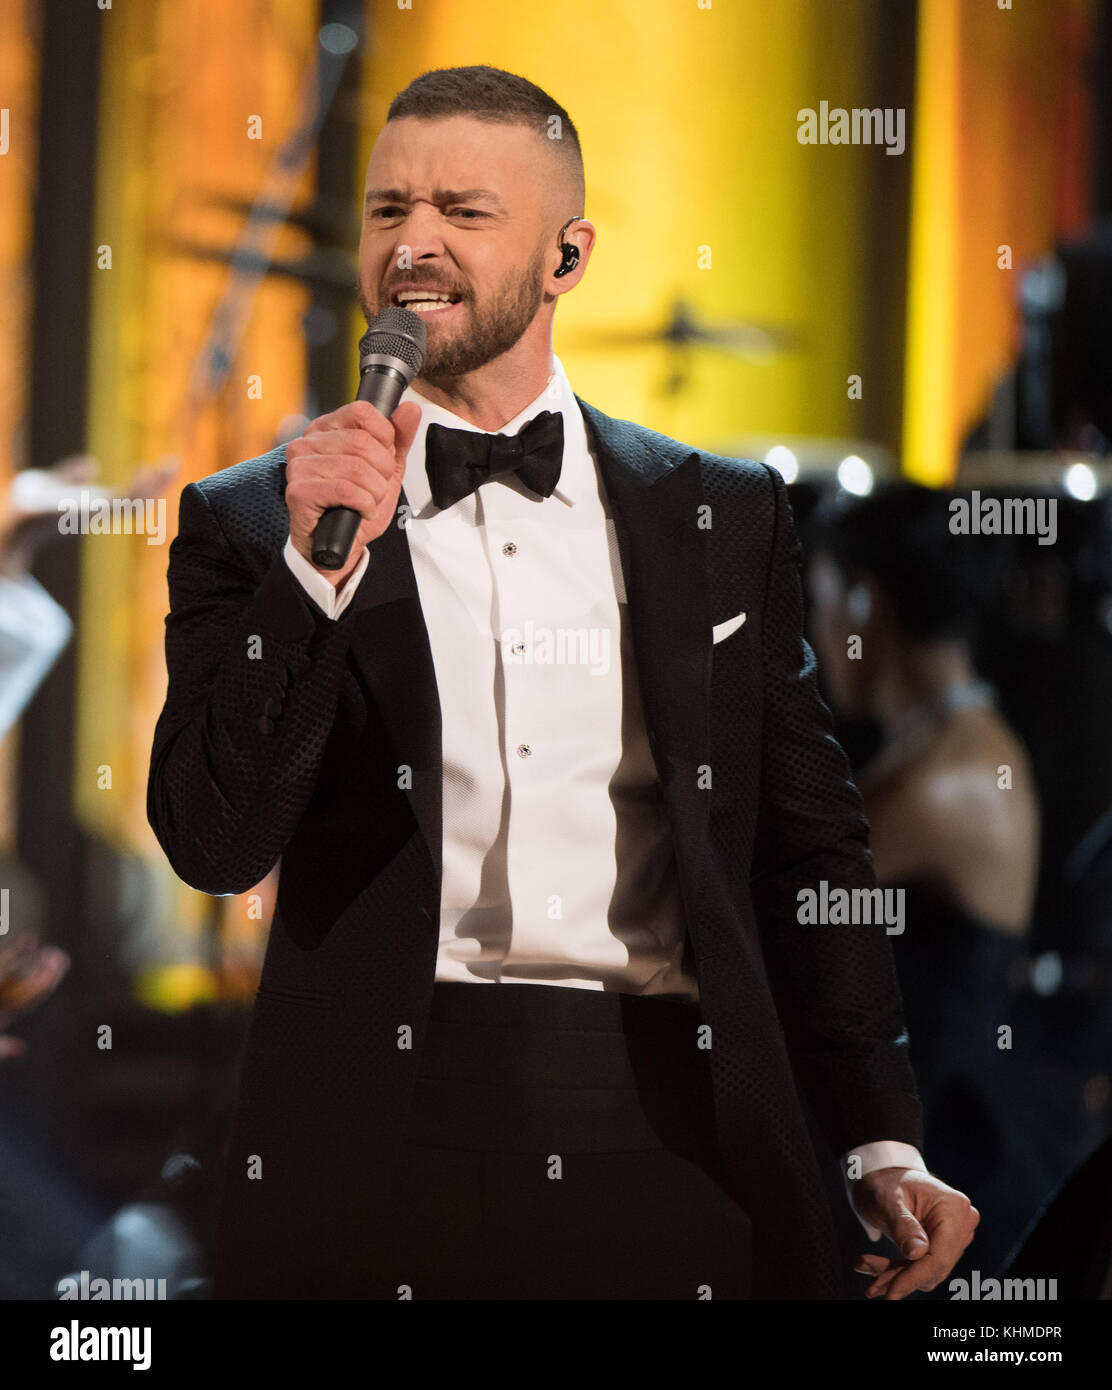 Hollywood, CA - 26 febbraio: Justin Timberlake assiste l'ottantanovesimo annuale di Academy Awards di Hollywood Foto Stock